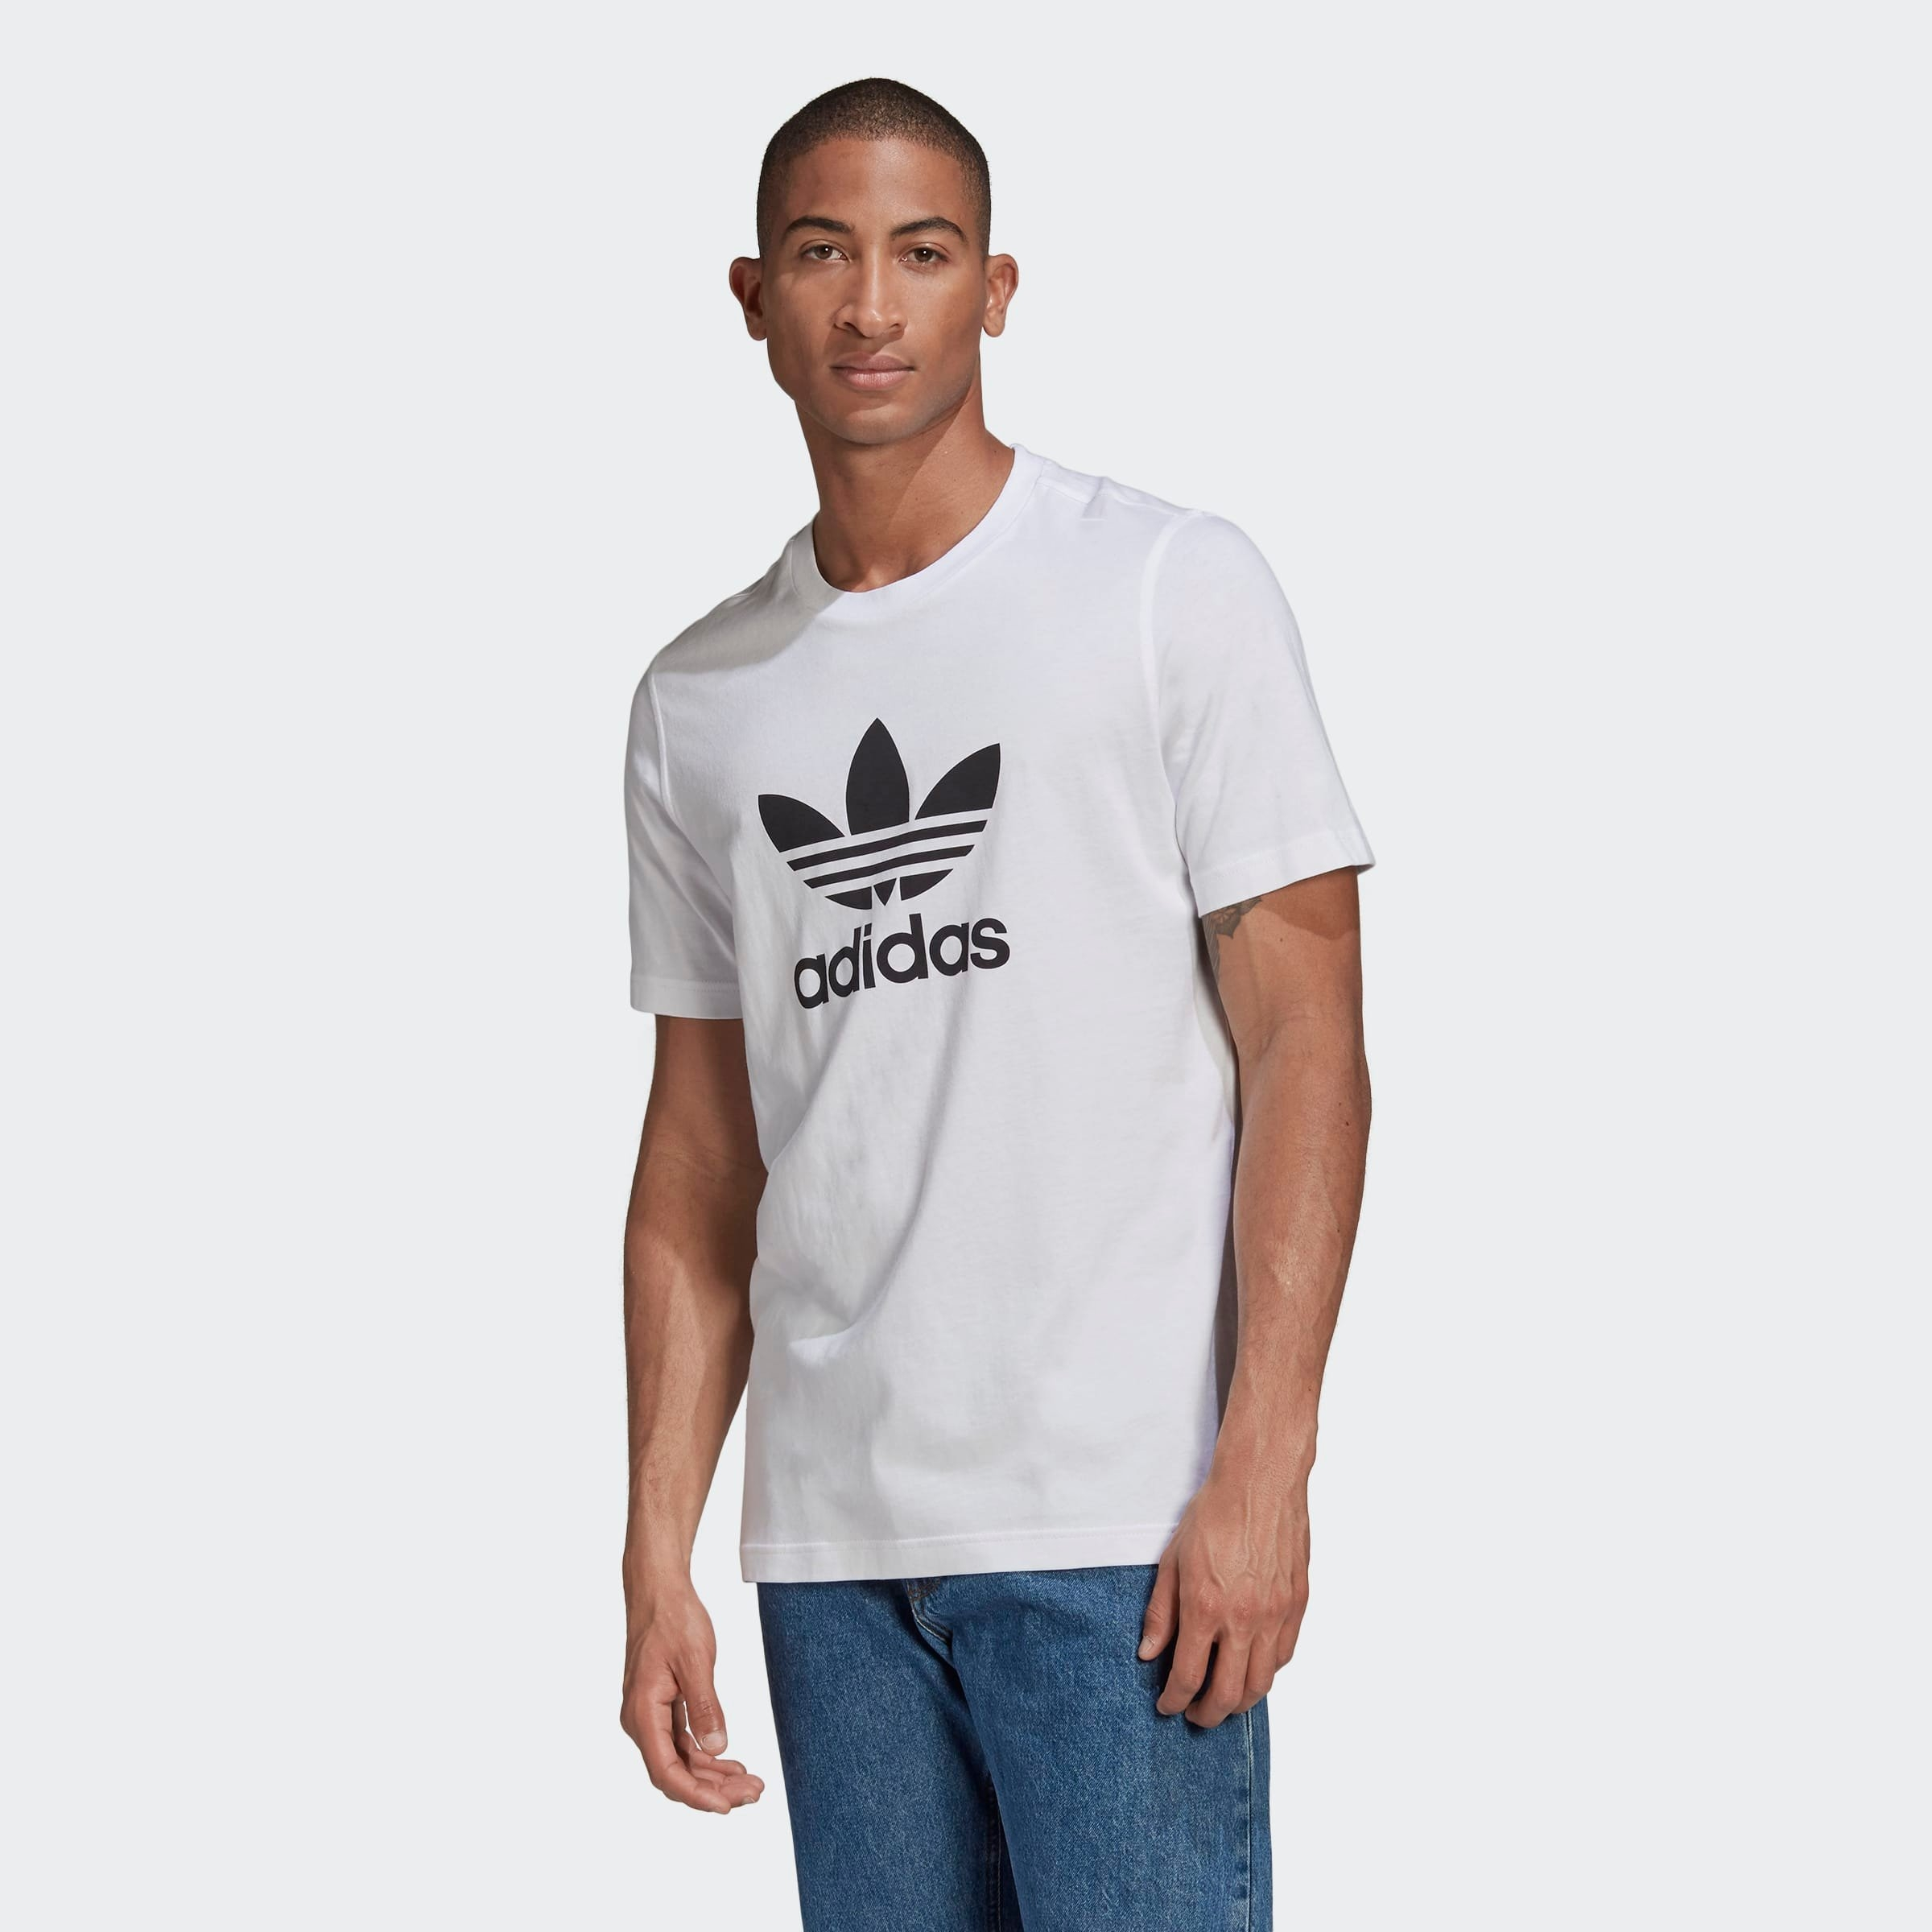 adidas Originals T-shirt ADICOLOR CLASSICS TREFOIL nu online kopen bij OTTO